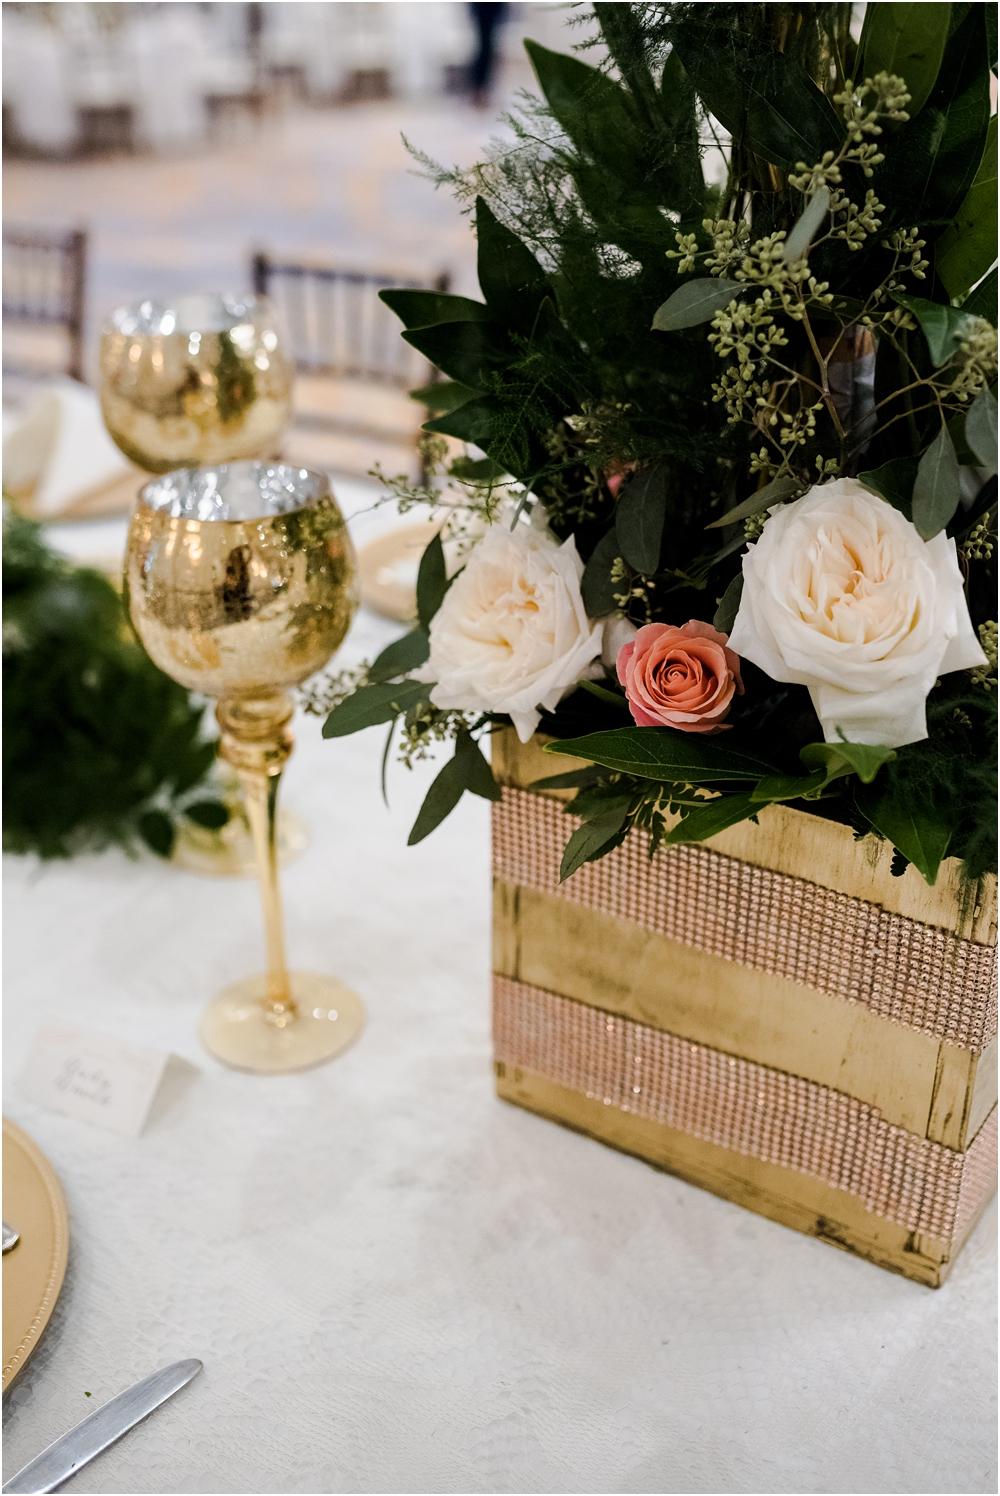 amack-wedding-kiersten-stevenson-photography-30a-panama-city-beach-dothan-tallahassee-(311-of-882).JPG